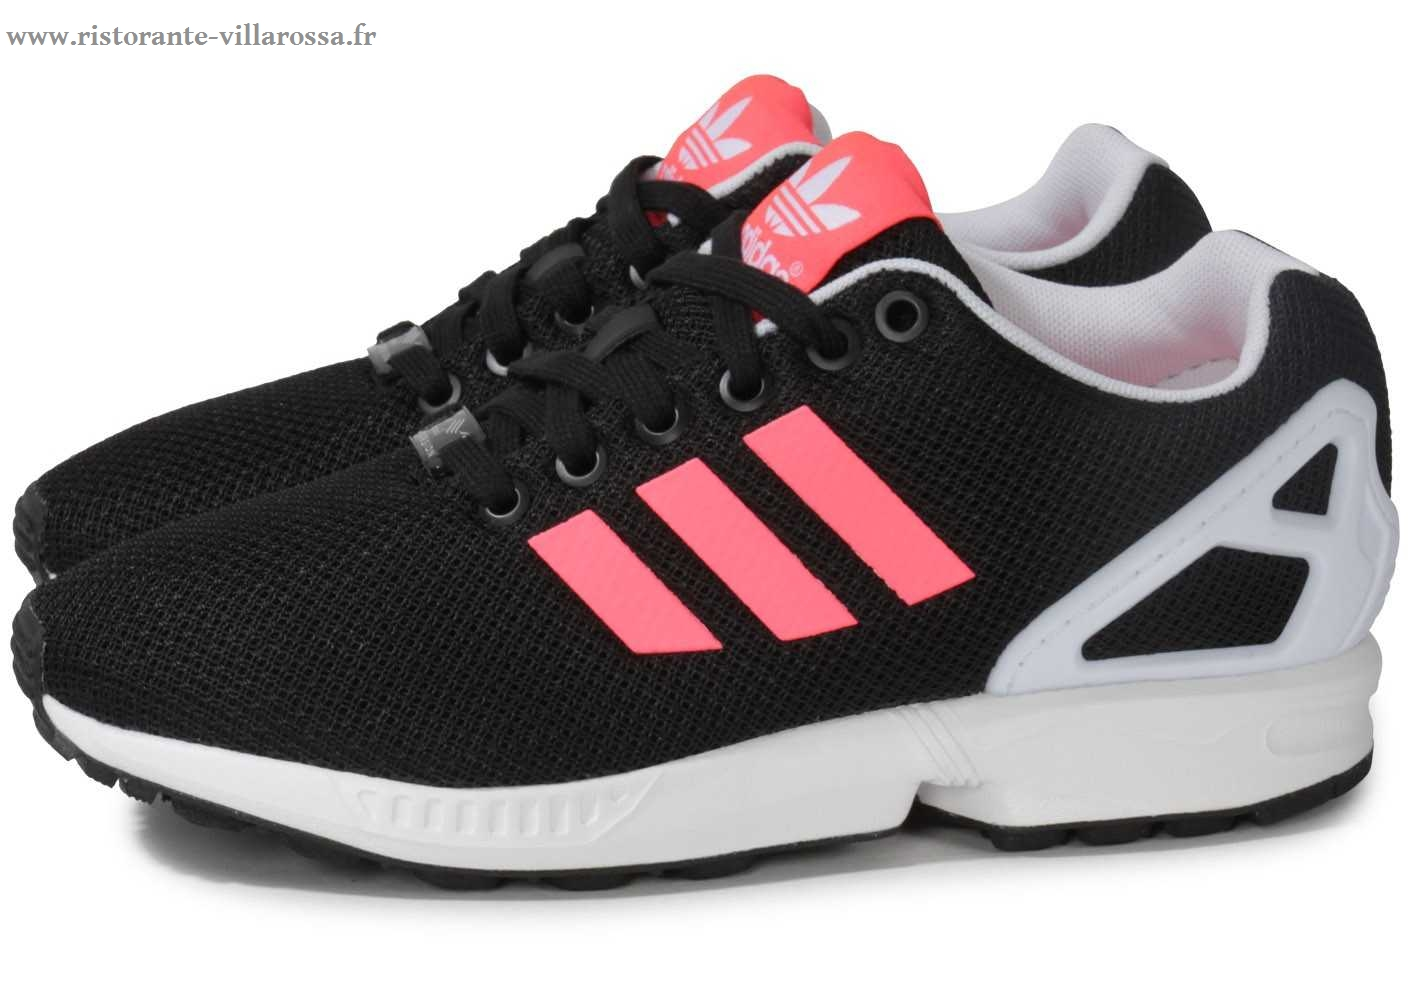 nouvelle adidas chaussure femme